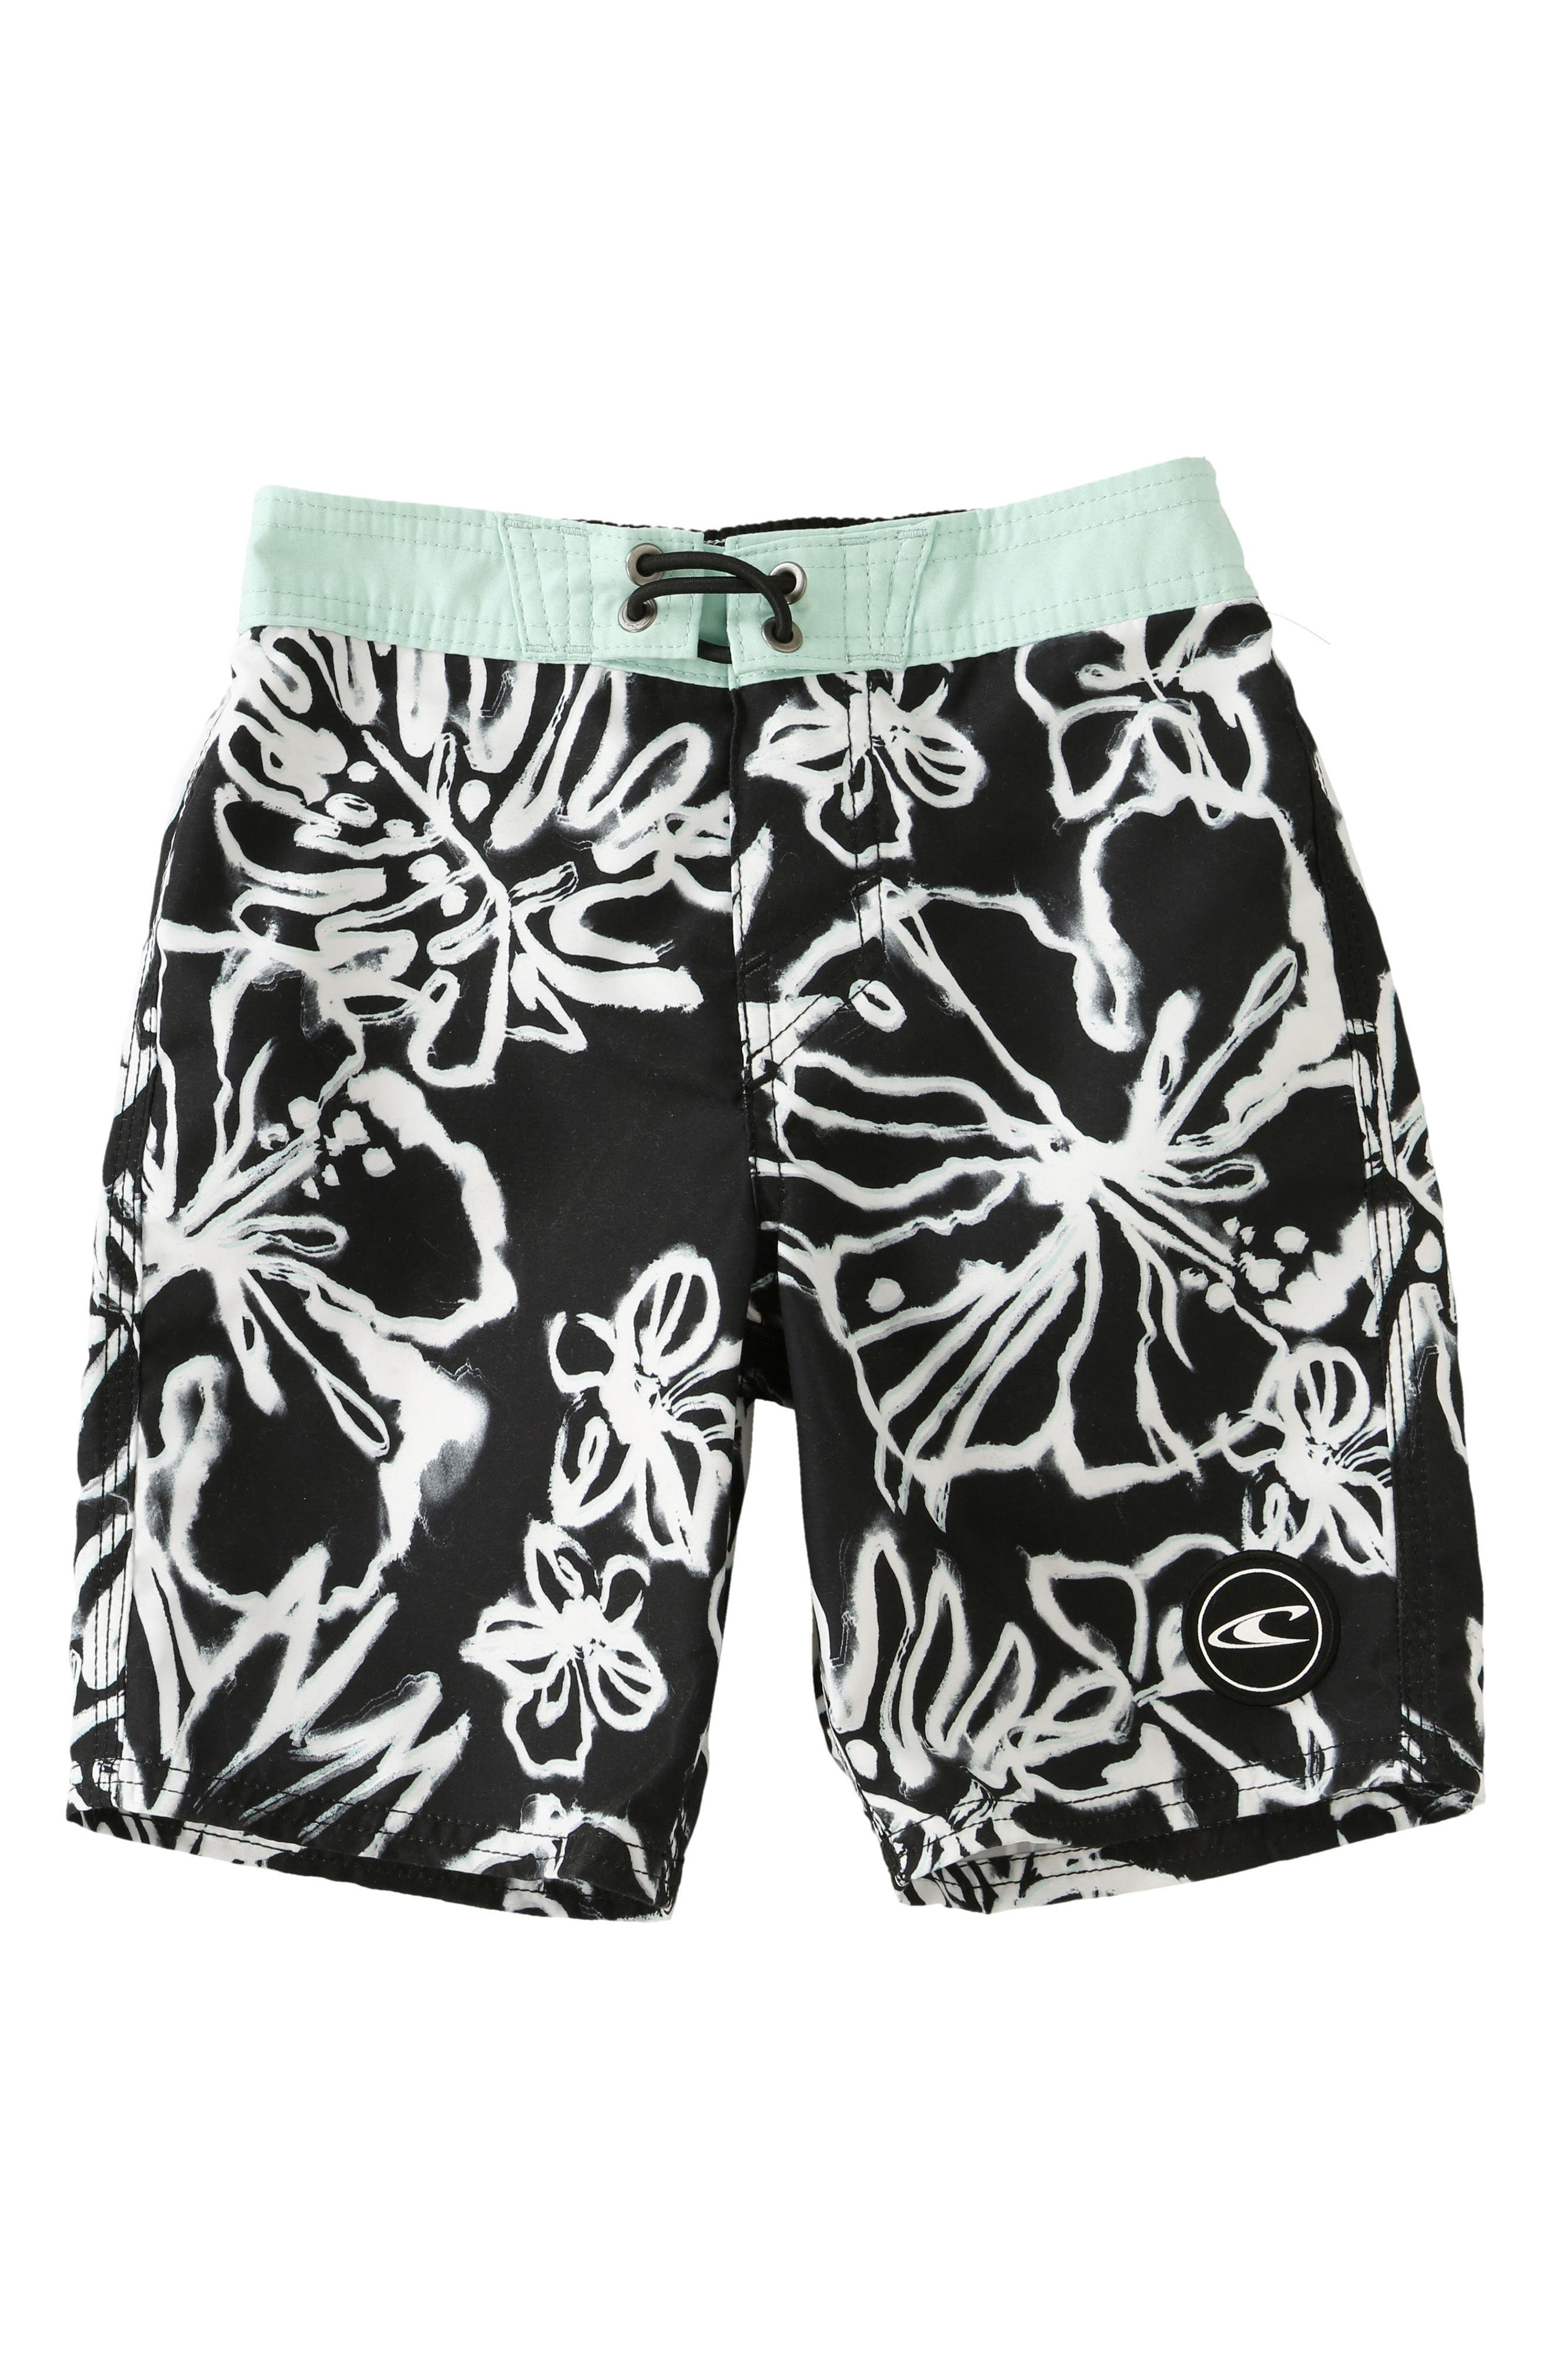 Hanalei Board Shorts,                             Main thumbnail 1, color,                             Black